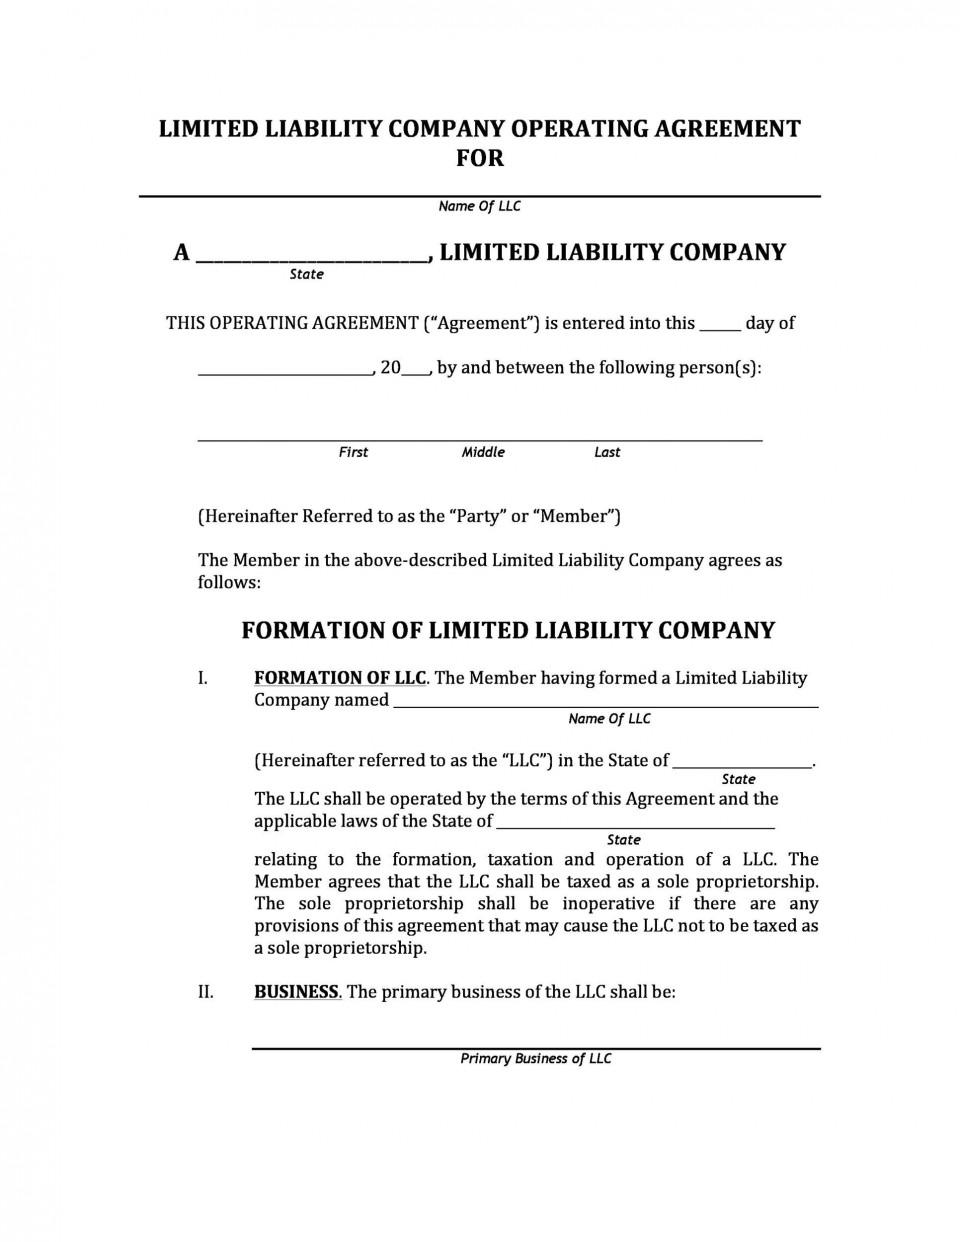 005 Top Operation Agreement Llc Template High Resolution  Operating Florida Indiana Single Member California960